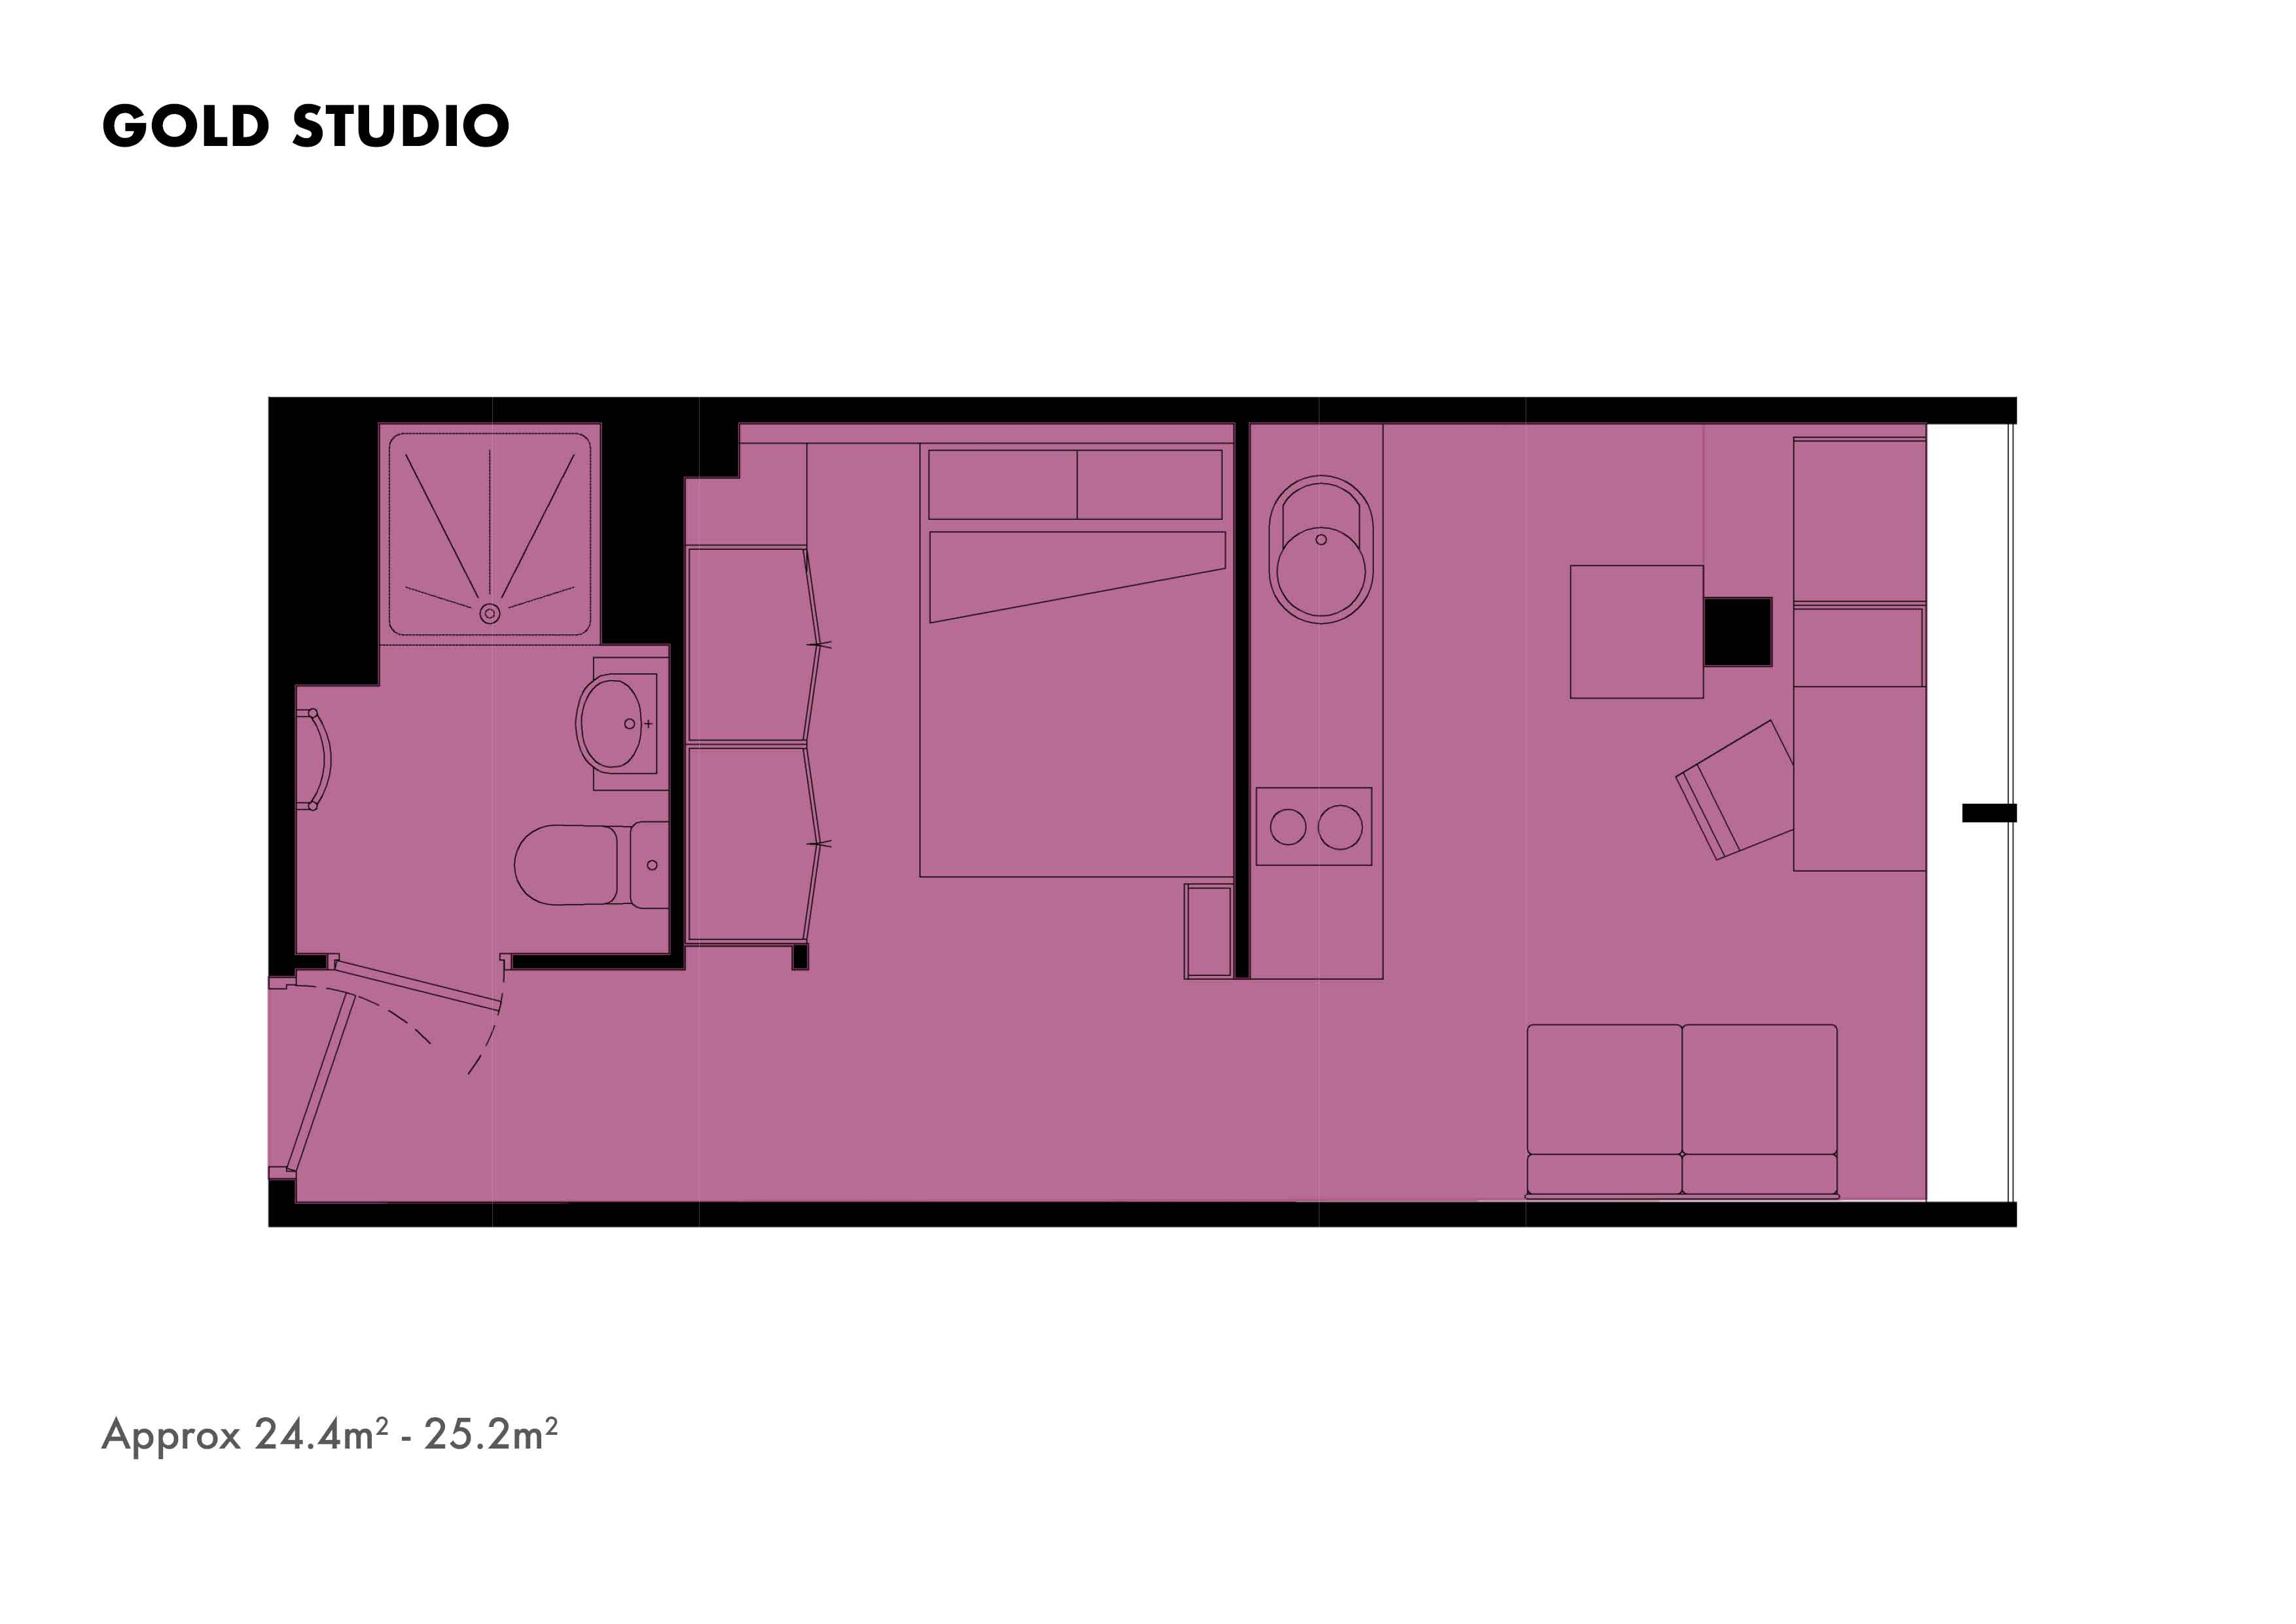 Gold Studio floorplans